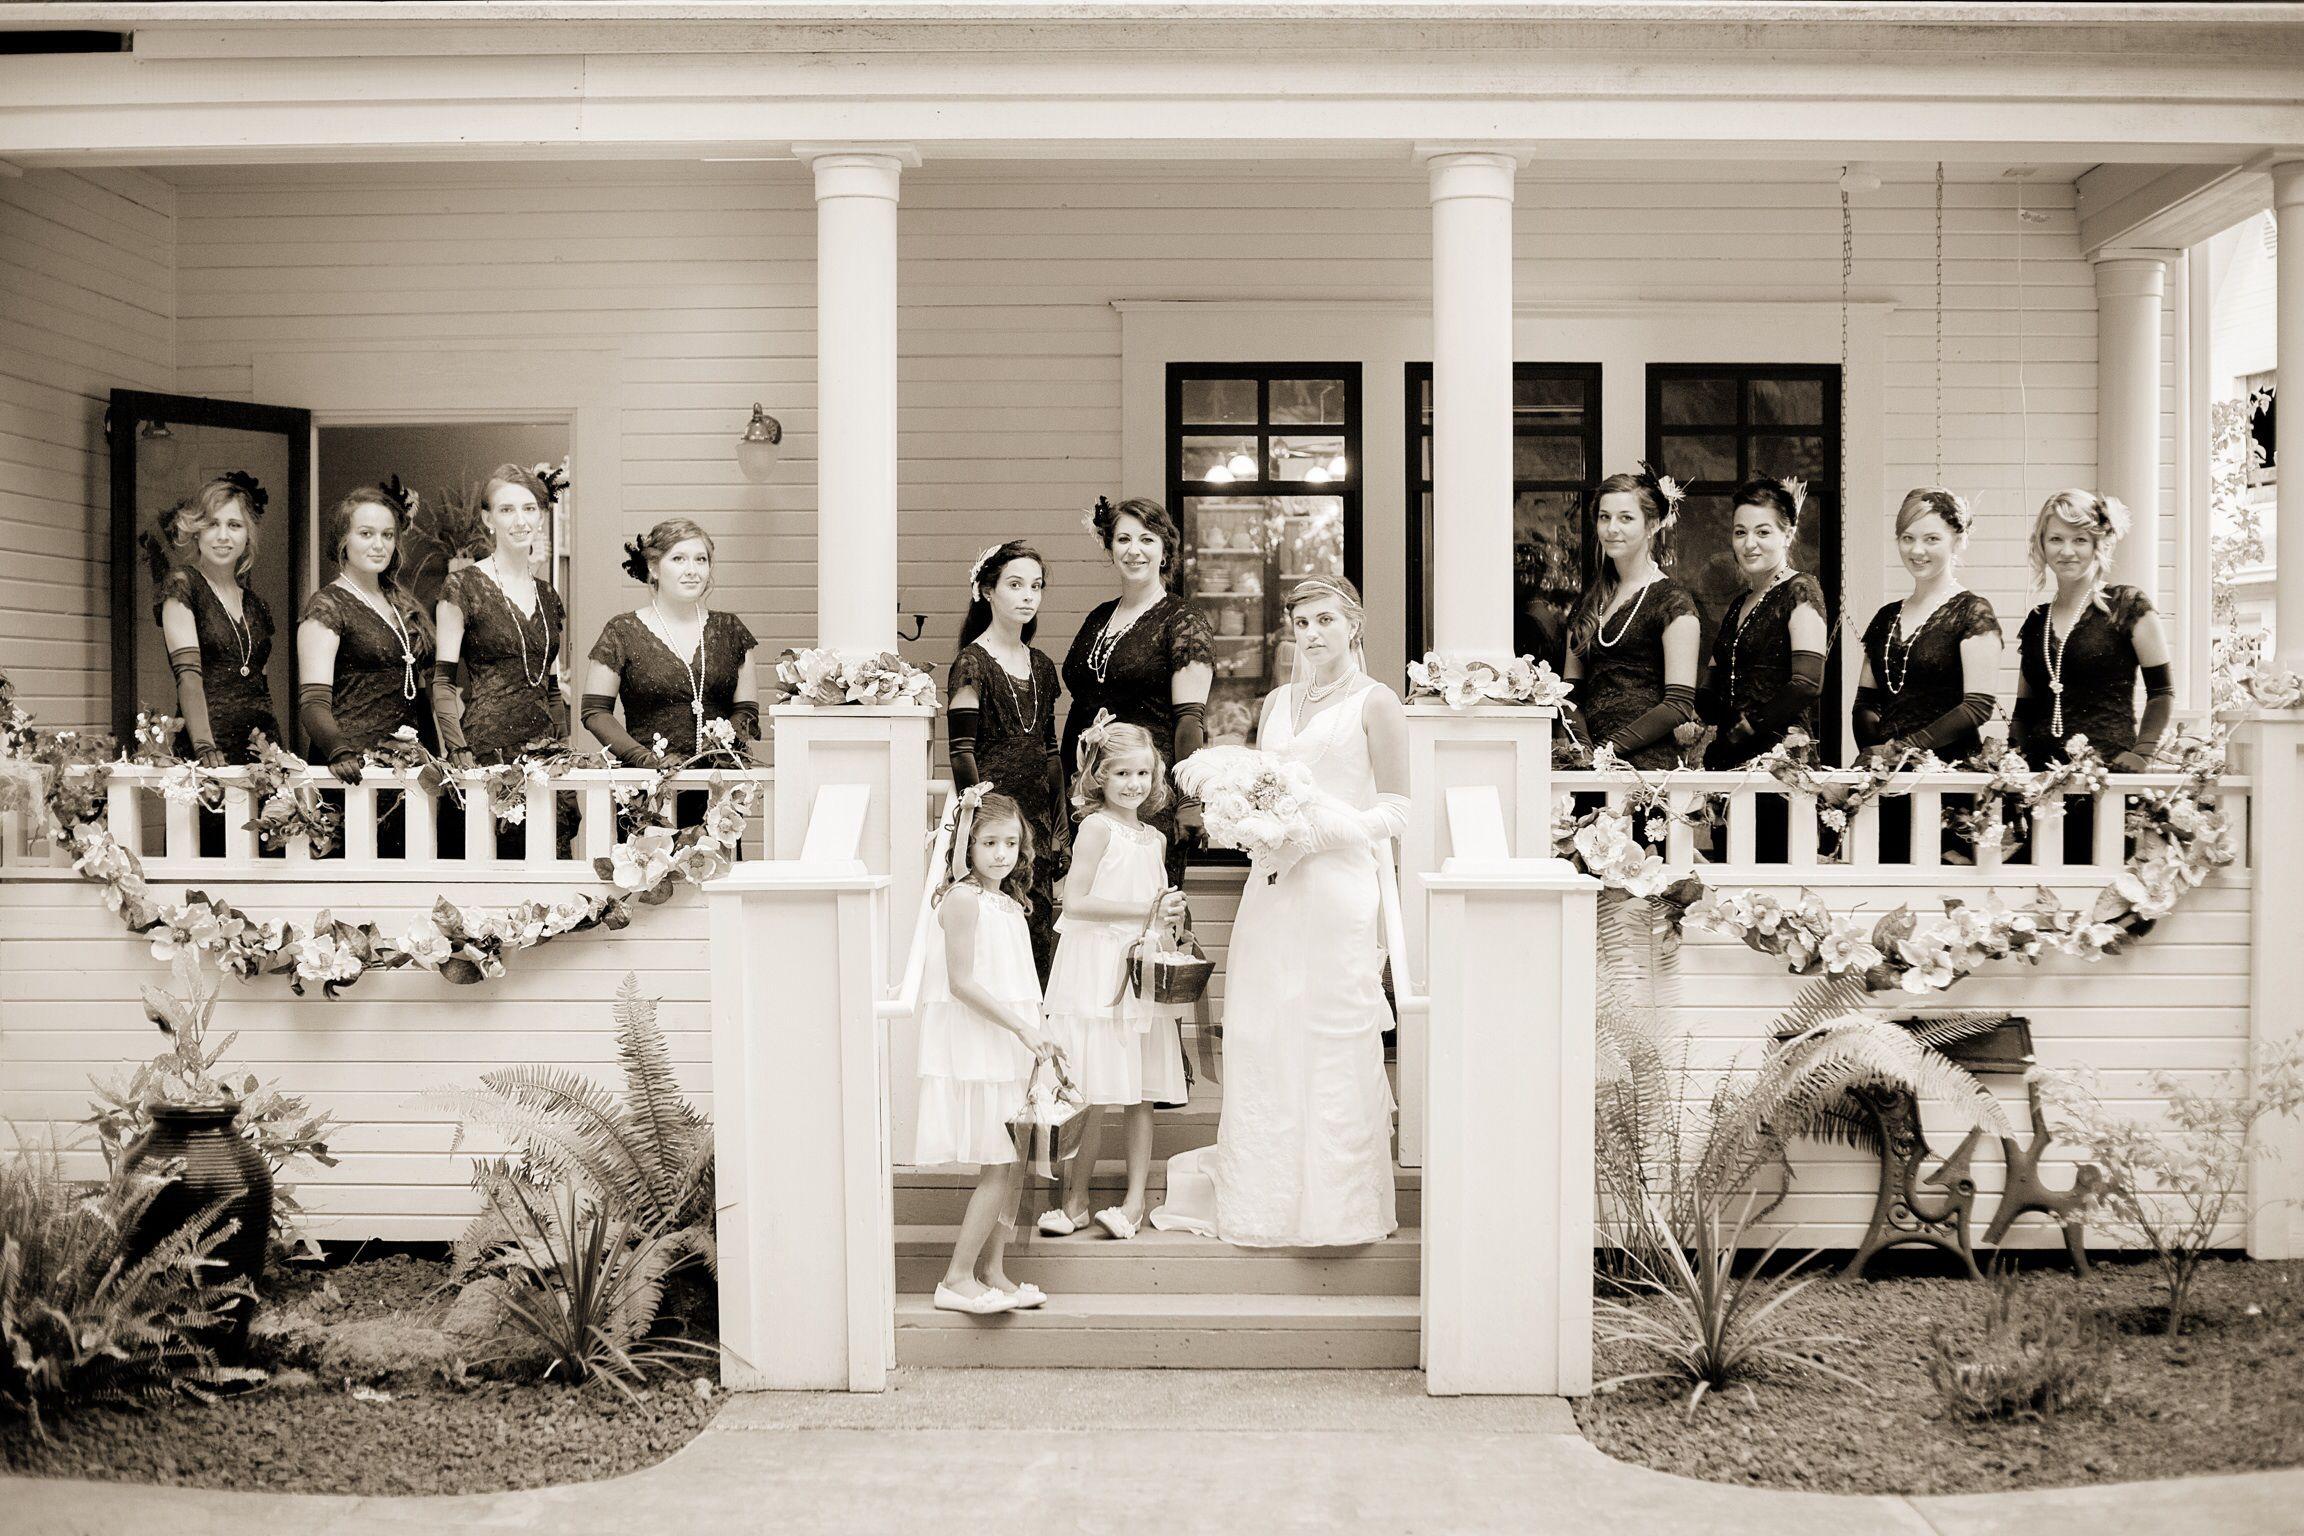 Bride And Bridesmaids 1910 1920s Themed Wedding Wedding